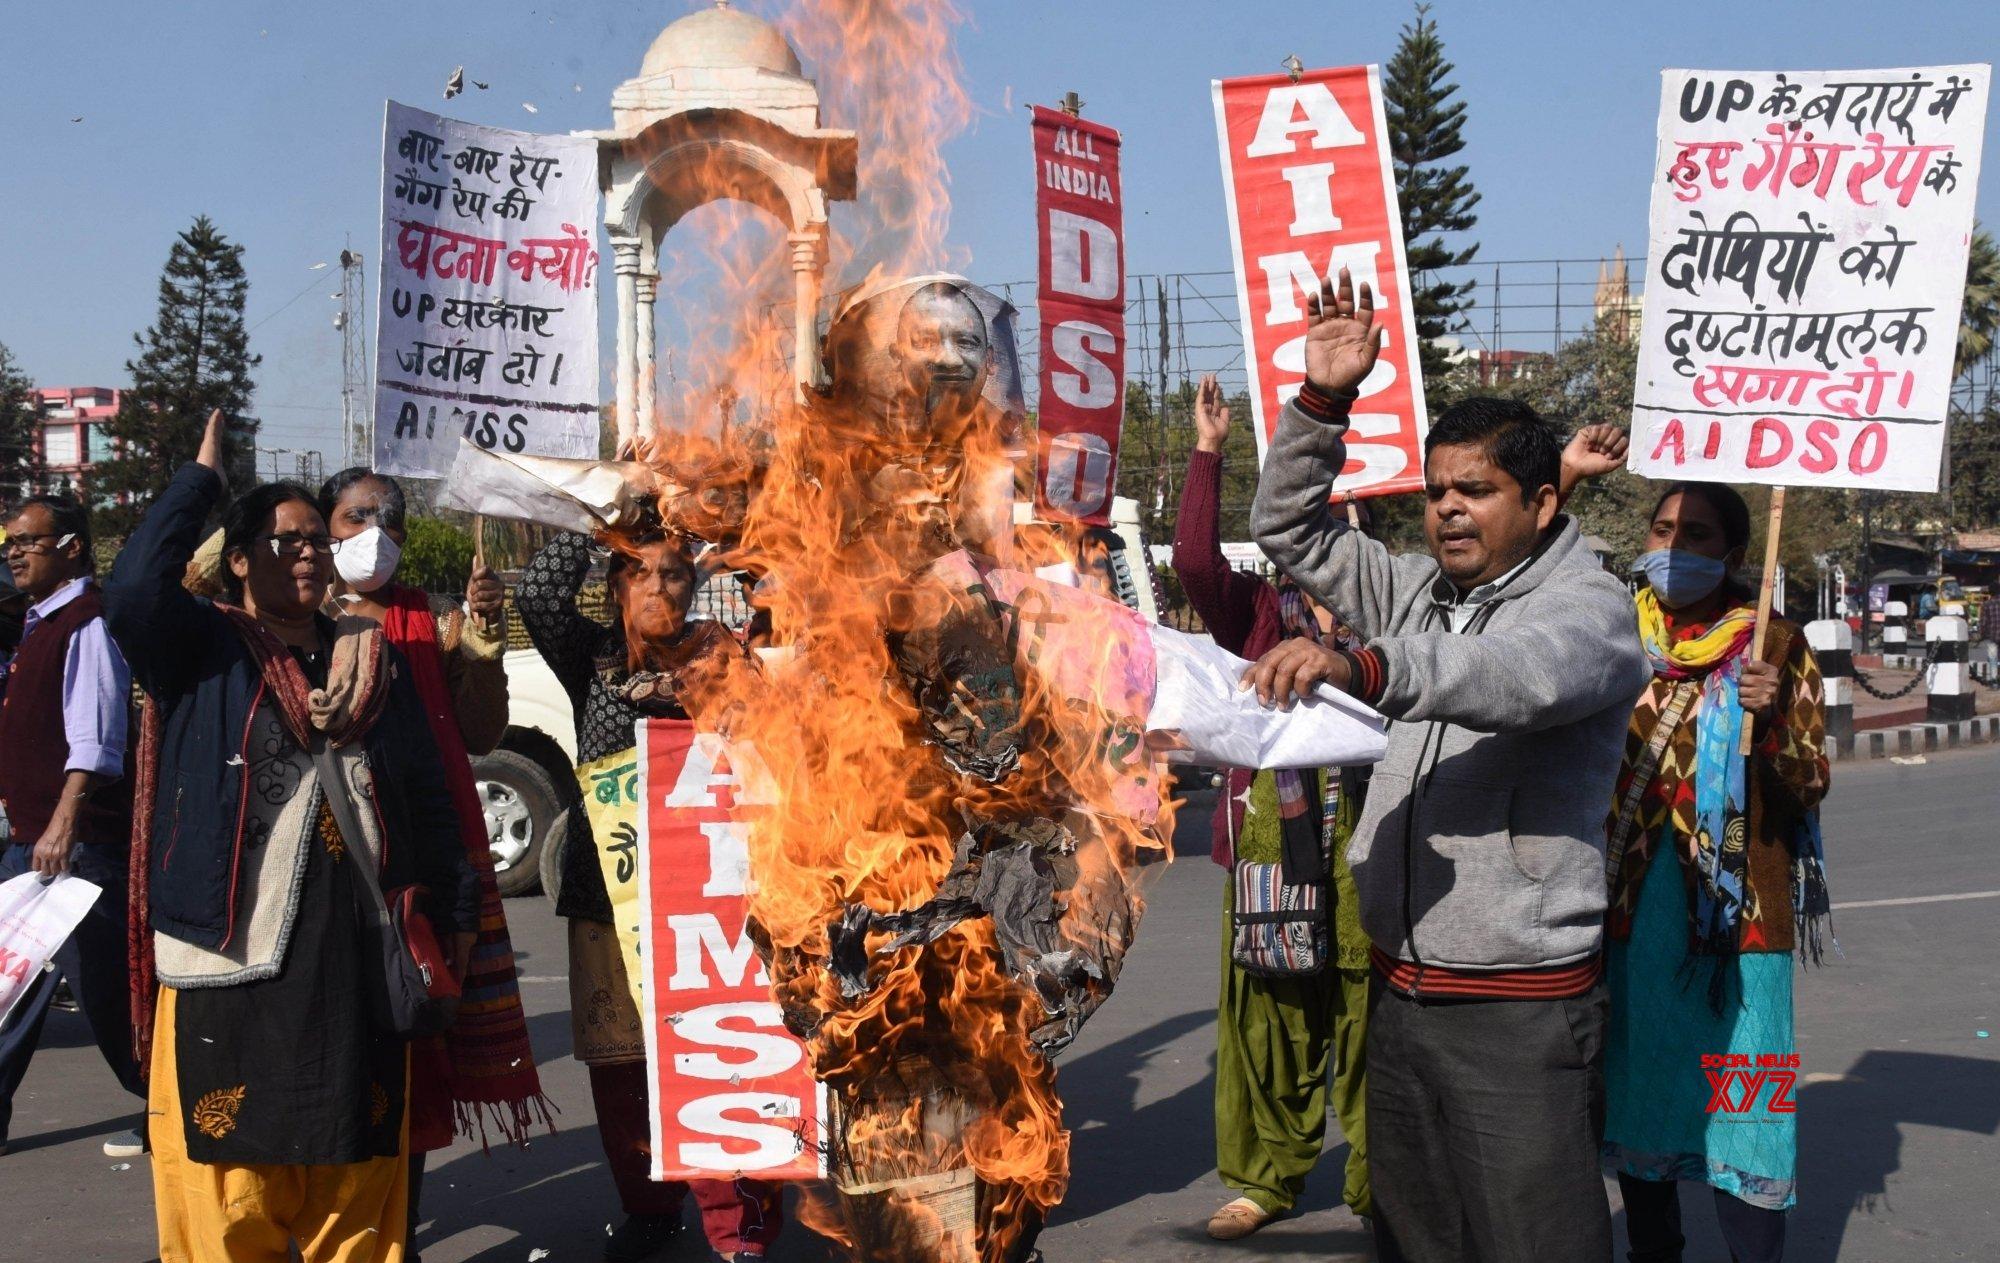 Patna: - All India Mahila Sanskrtik Sangathan, AIDSO activists burn effigy of UP CM Adityanath Yogi in a protest against Badaun rape case #Gallery